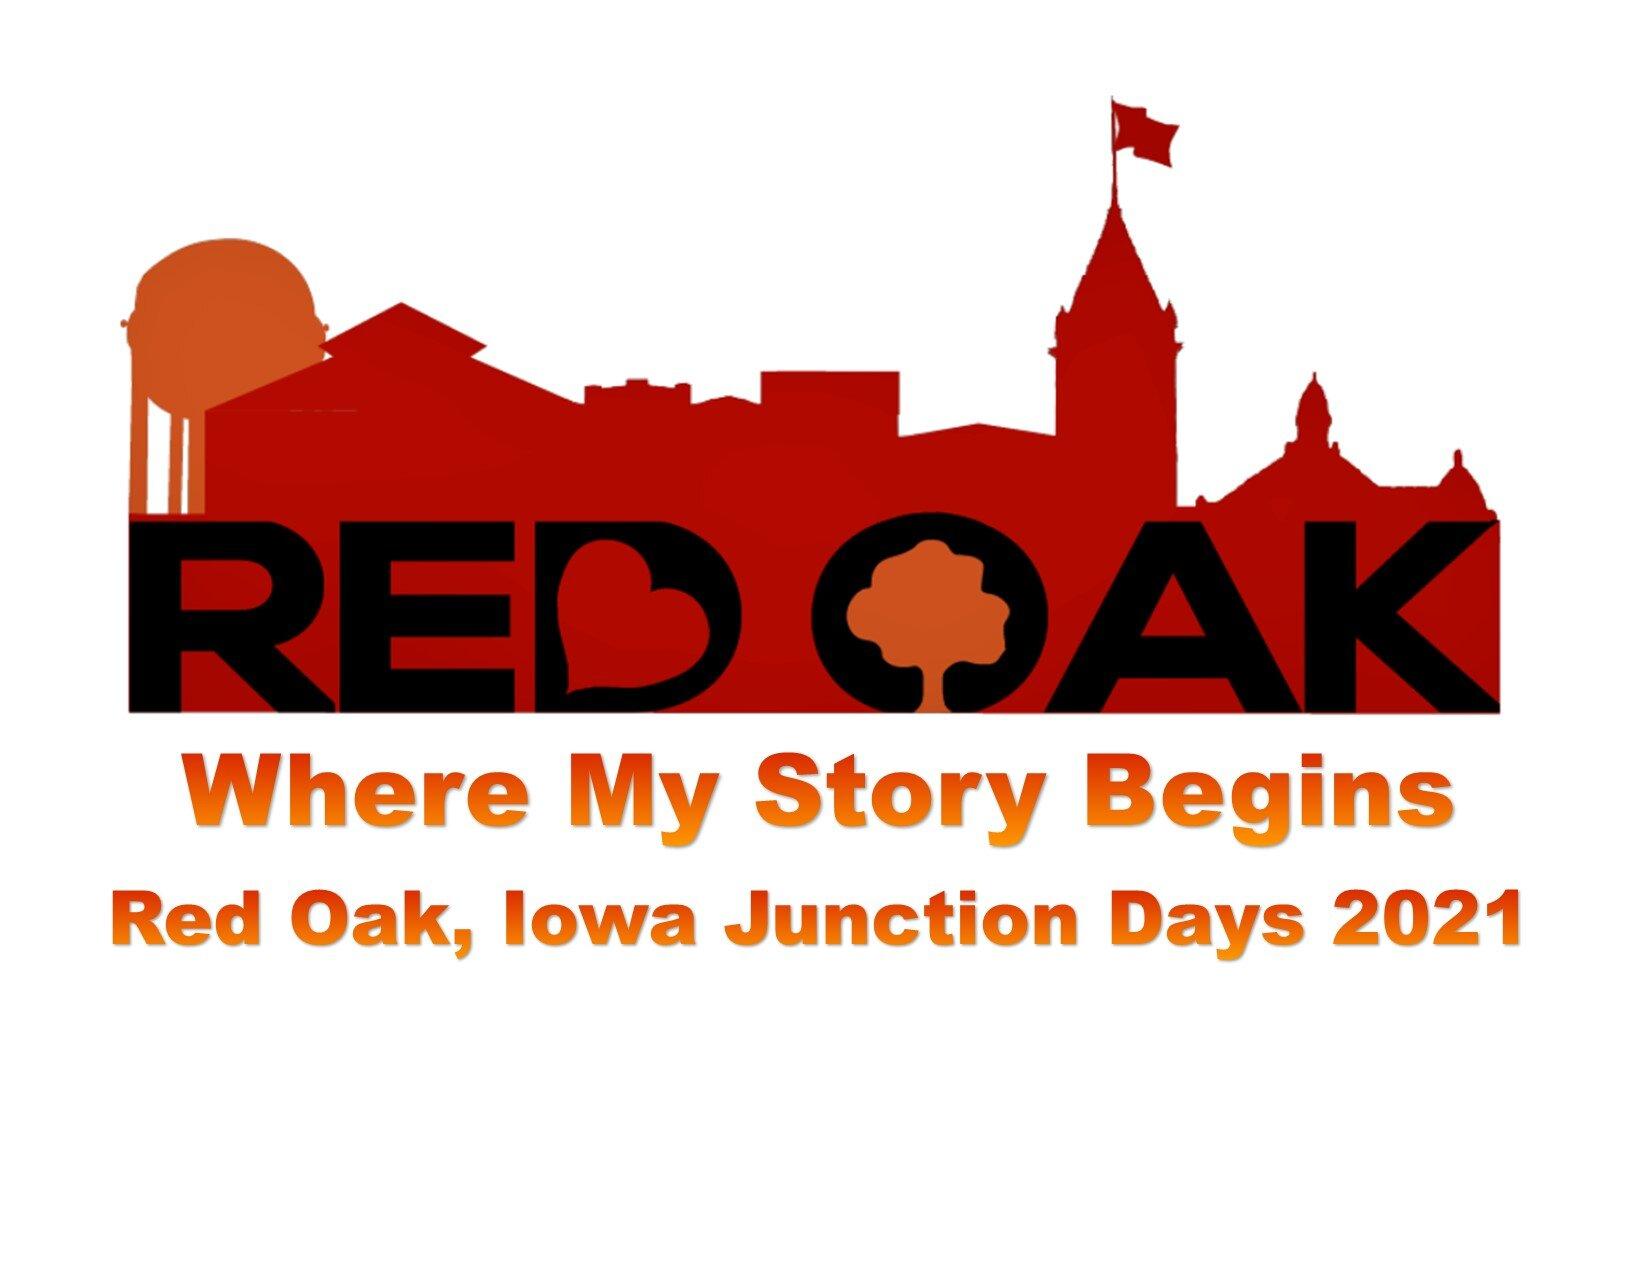 Junction Days 2021